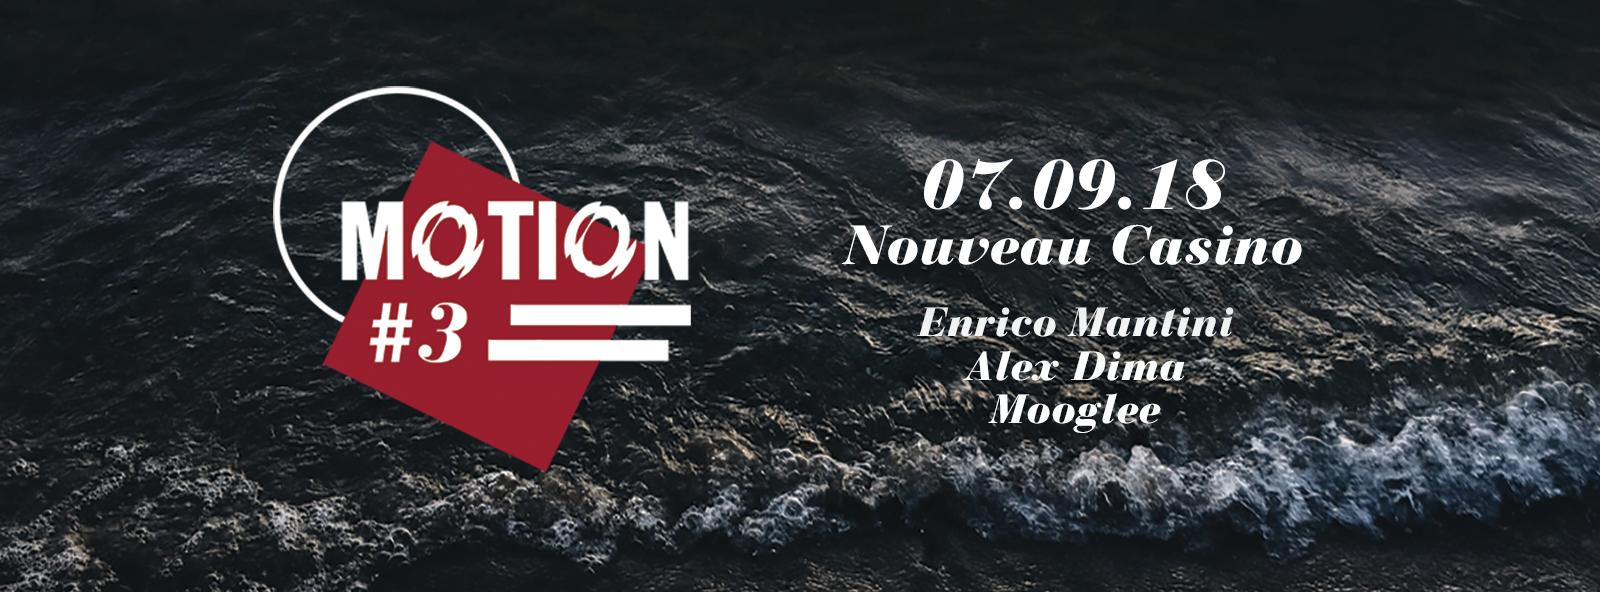 Motion #3 w/ Enrico Mantini, Alex Dima, Mooglee